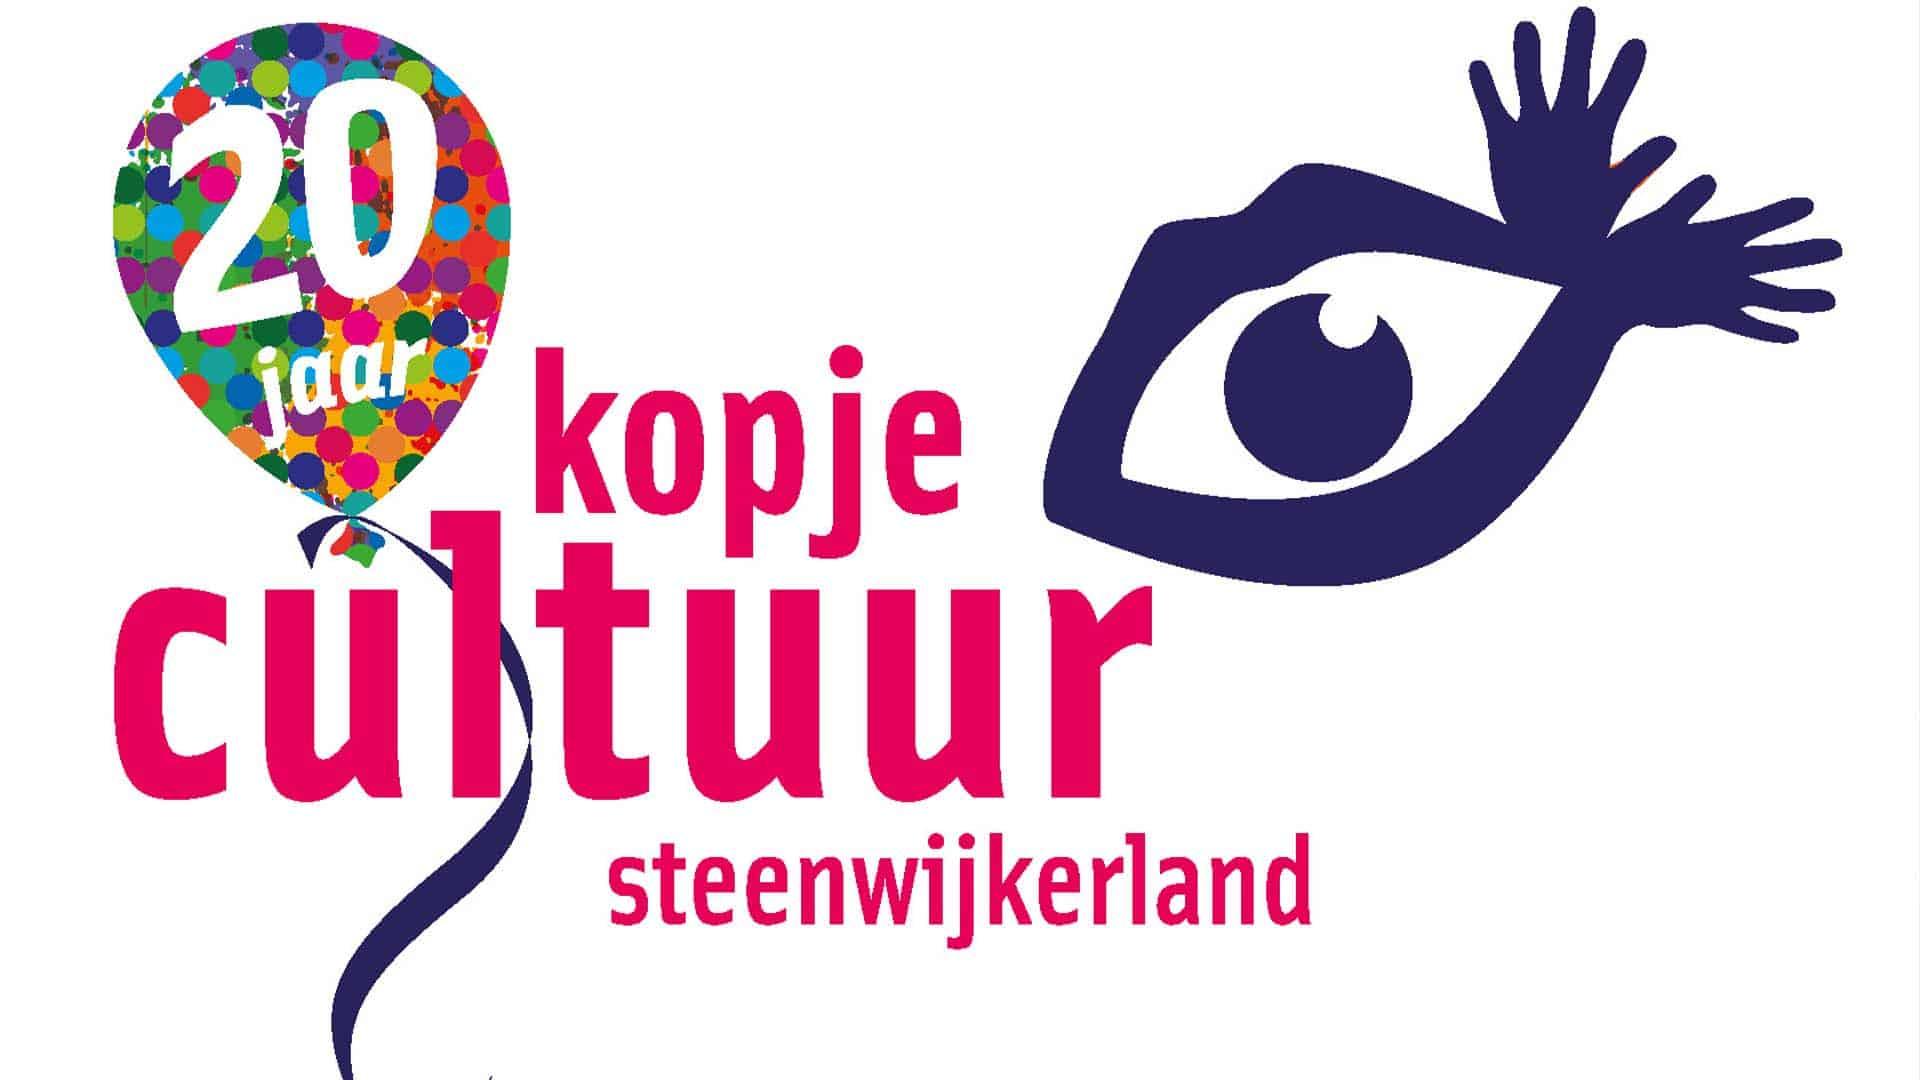 LogoKopjeCultuur.B20jaar